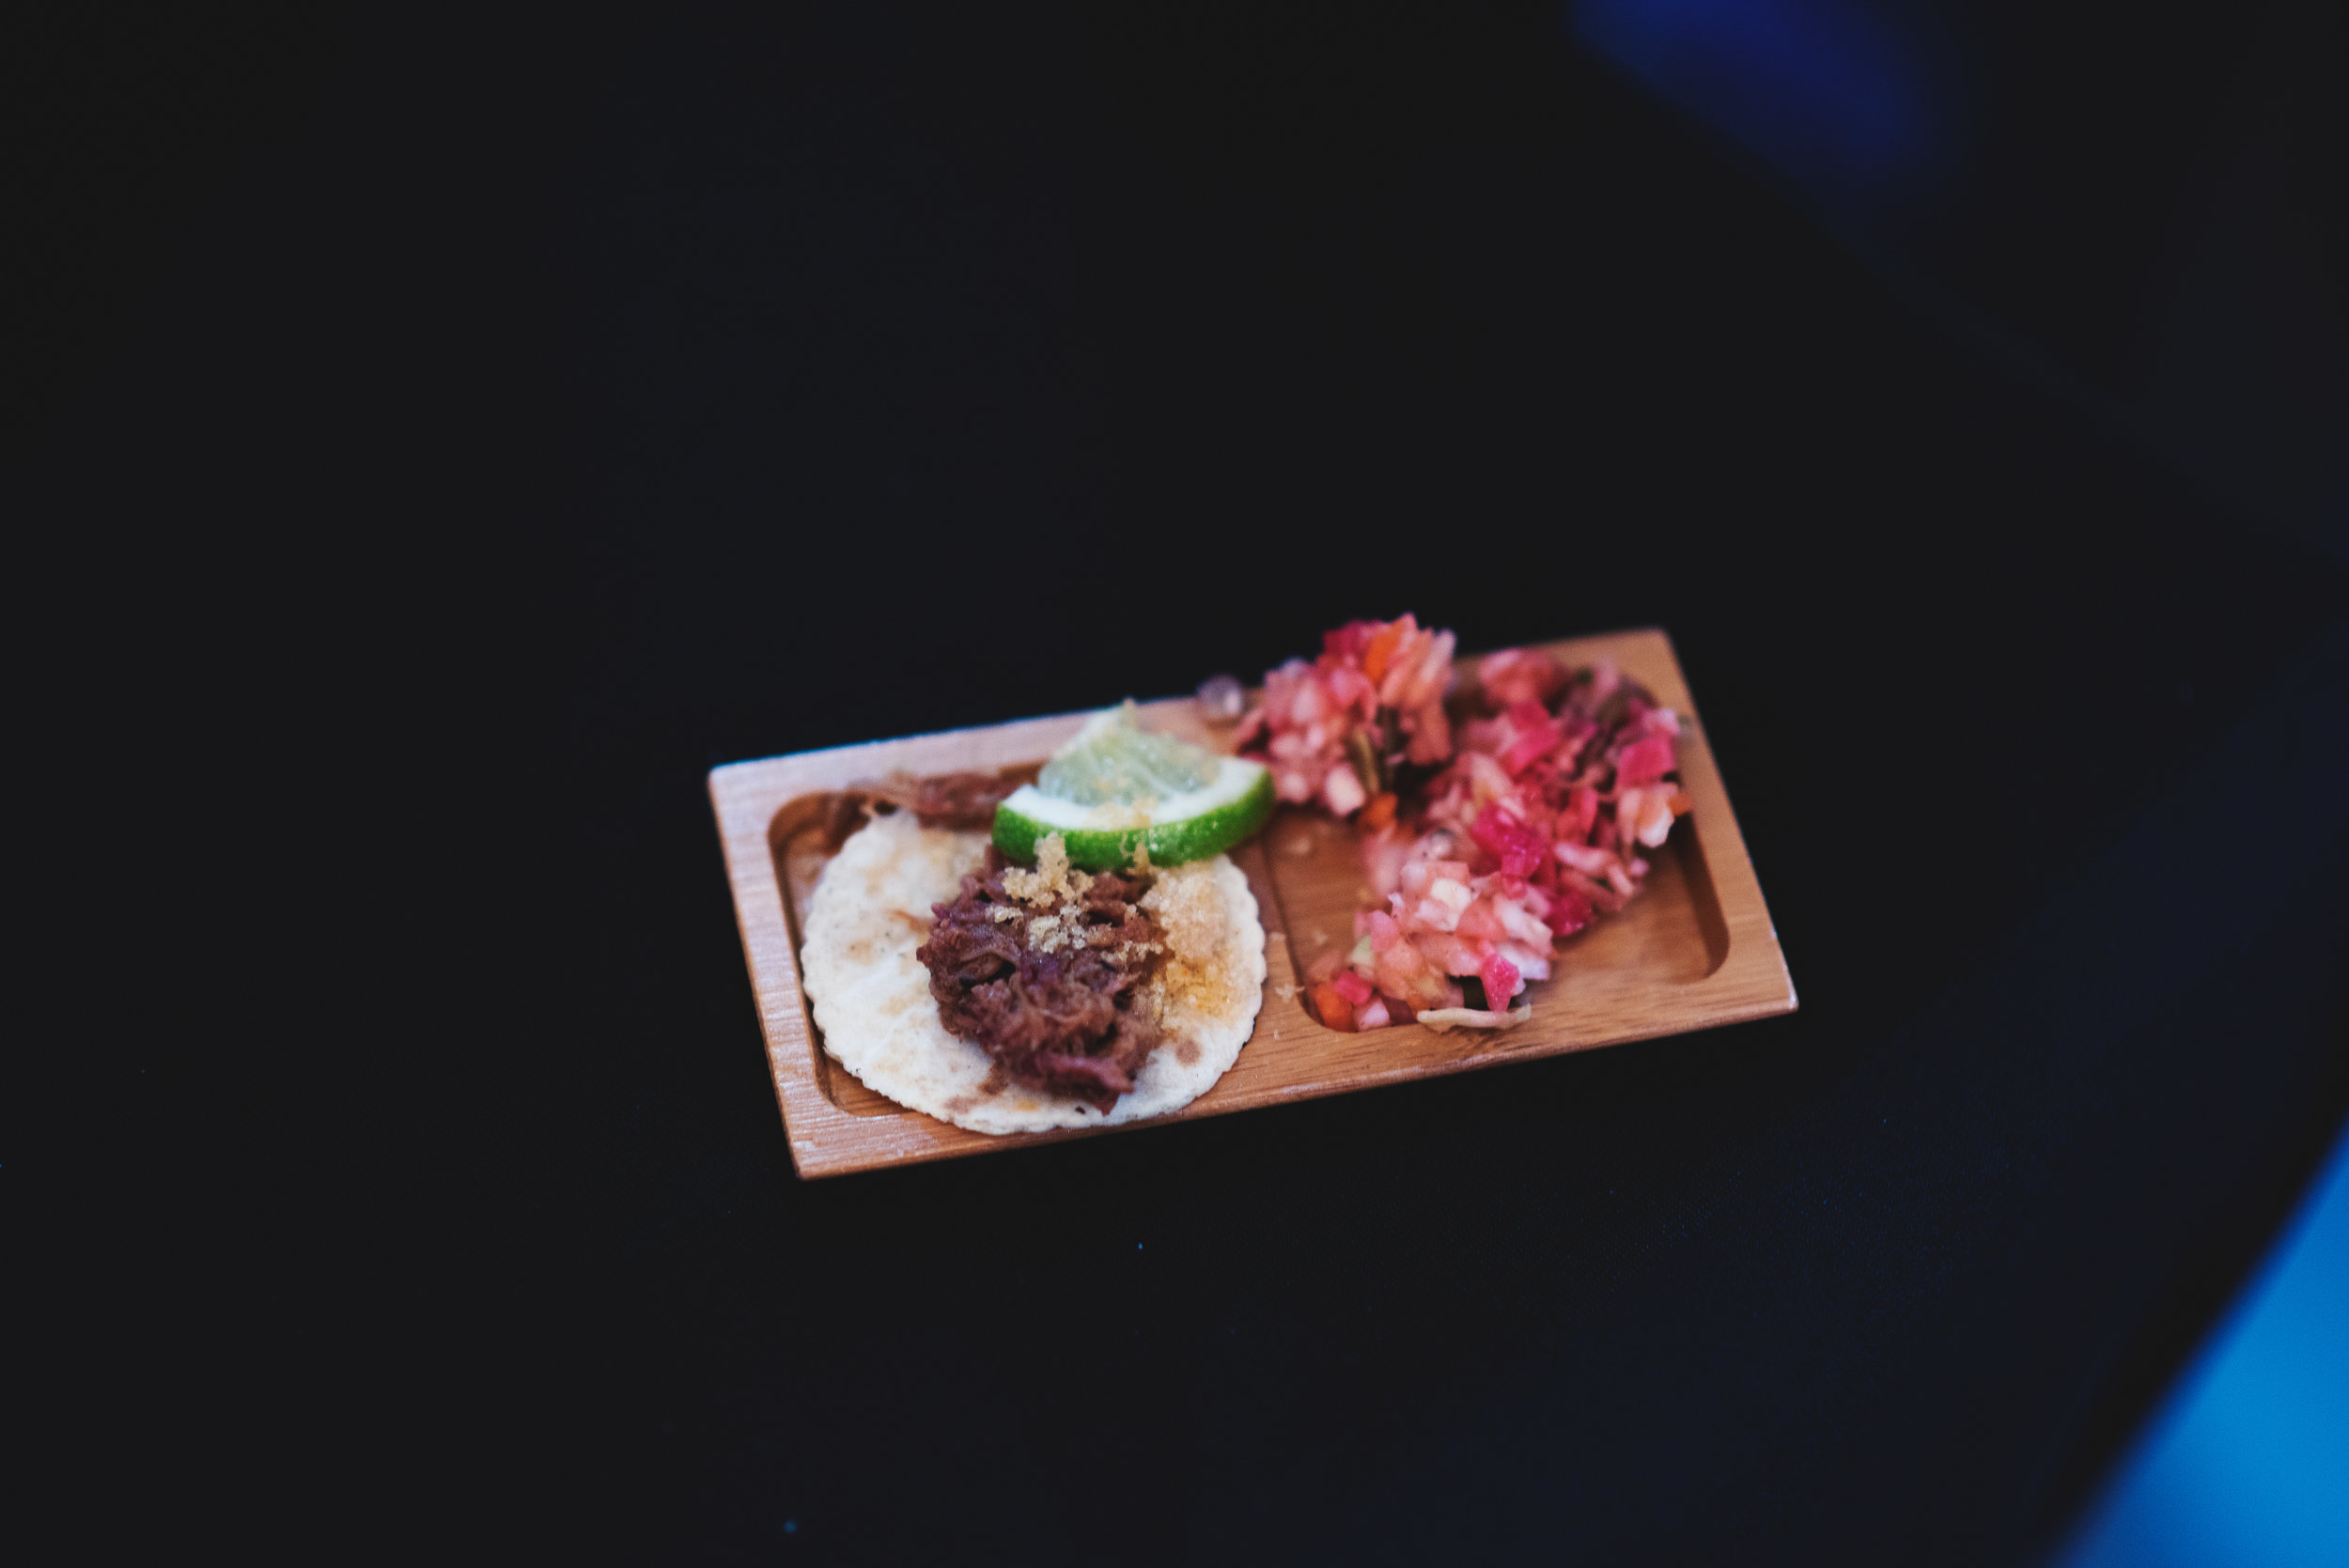 FoodFanaticsLive-Event-Food-Photography081.jpg